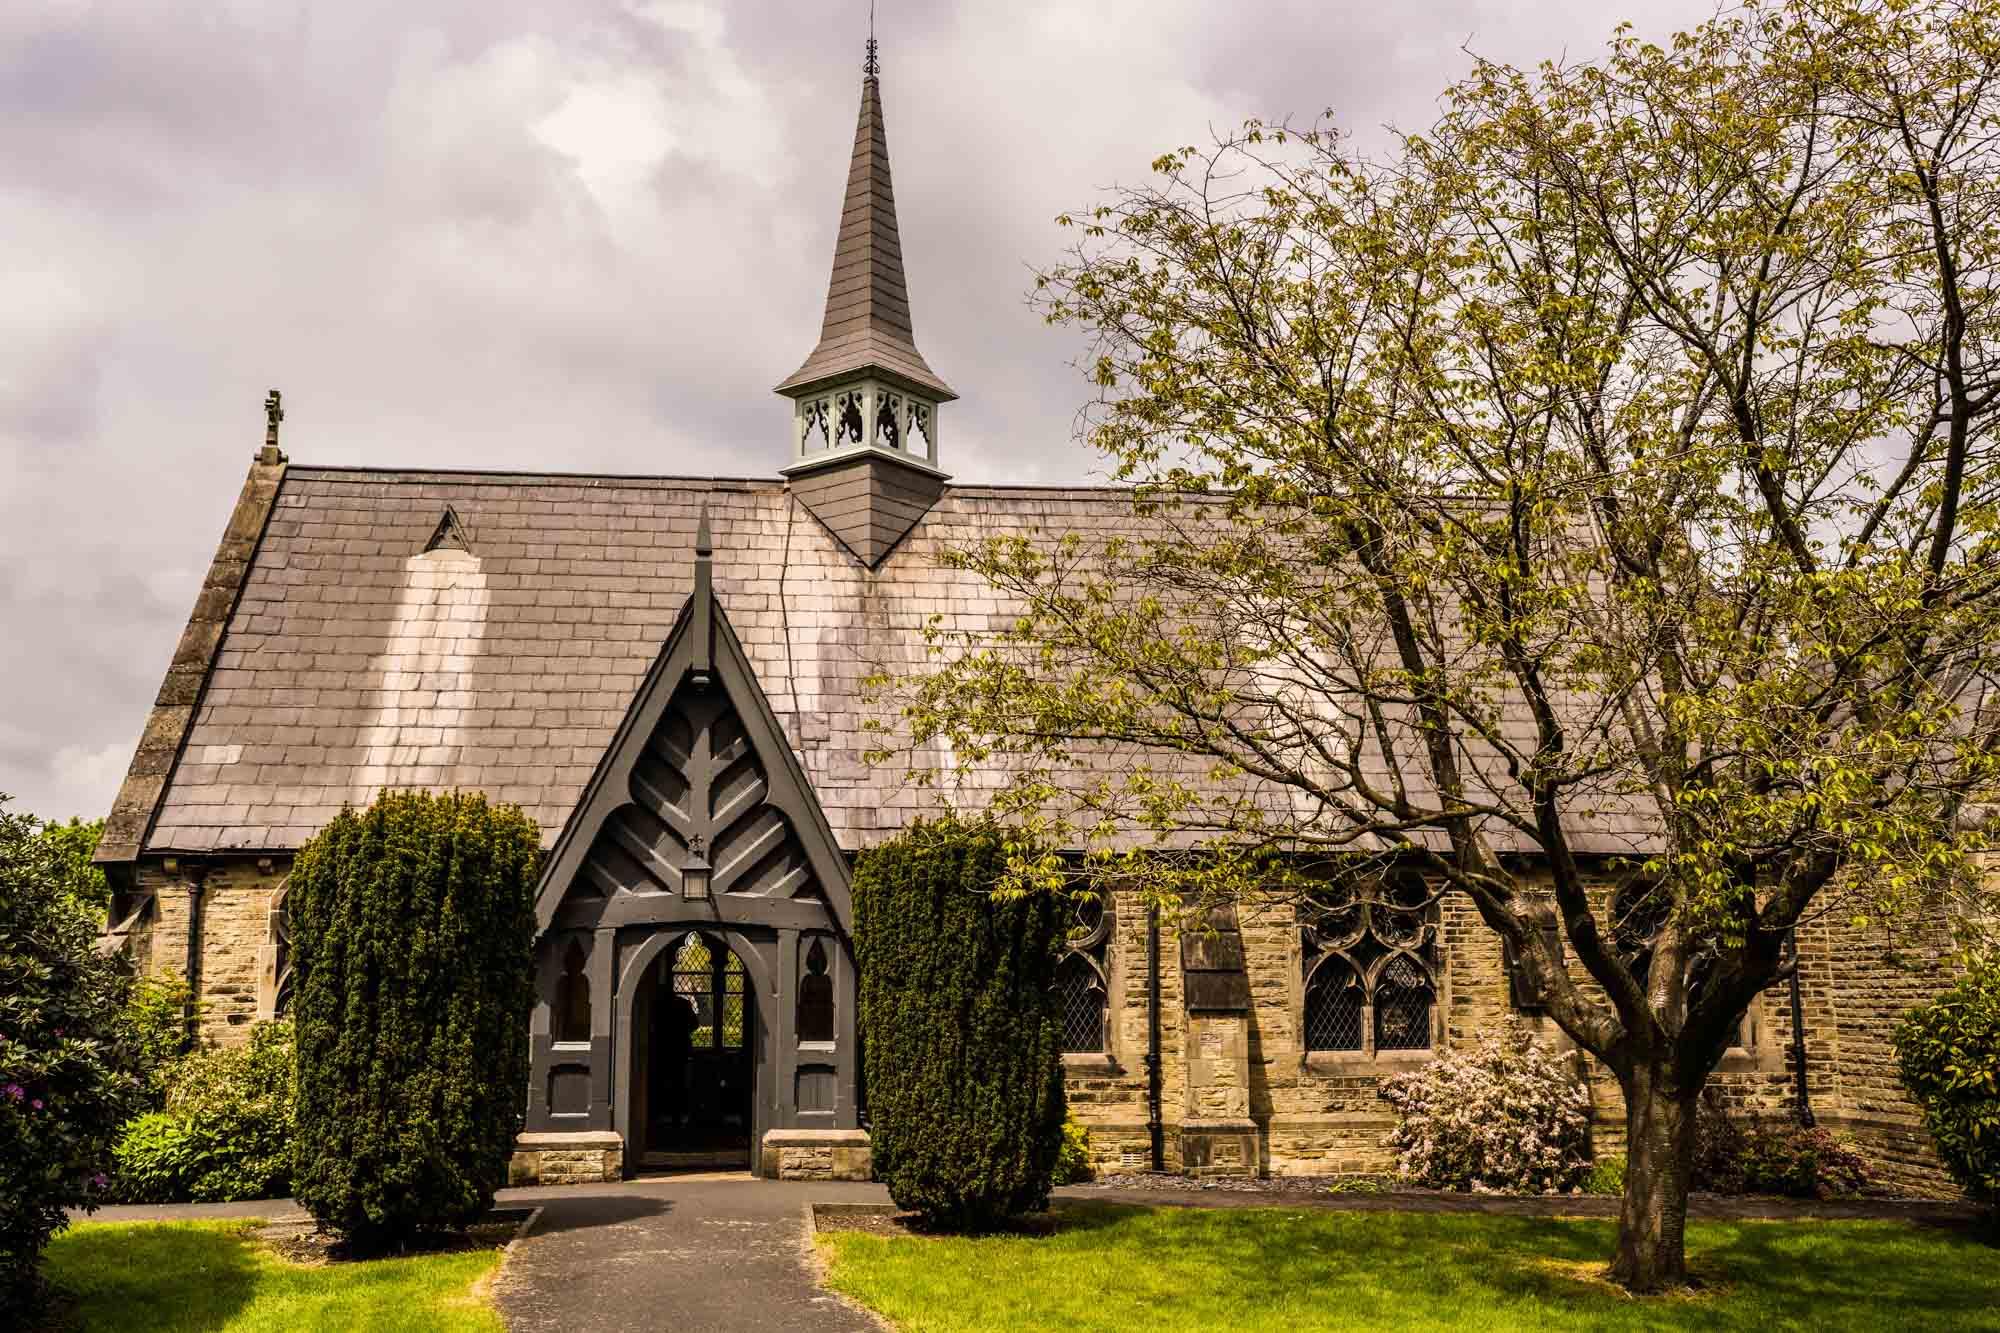 St Marks Dunham Massey